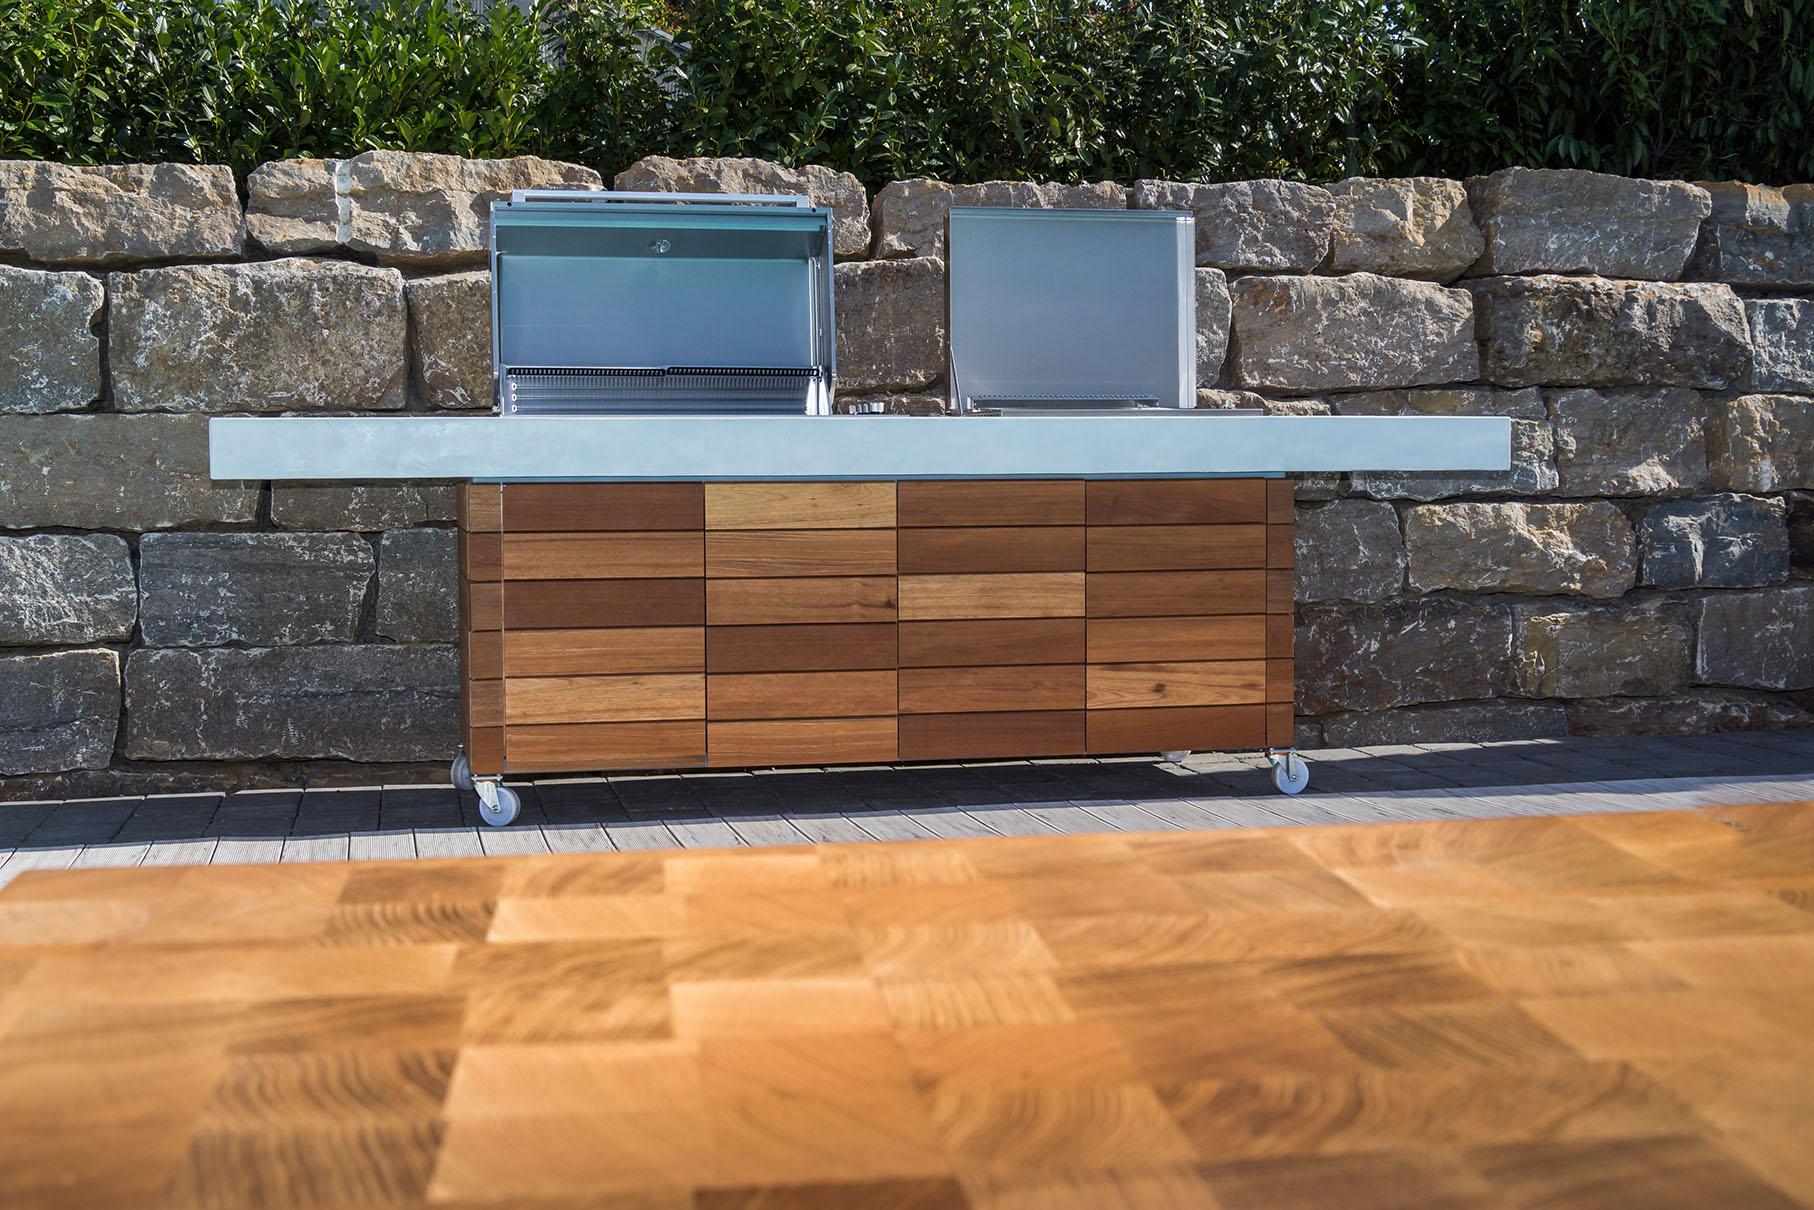 Aussenkueche Grill Beton Holz Outdoor Living Betonboden Gussboden fugenlos Treppe grau Küche Bad Badezimmer Wohnzimmer Tisch Möbel mainTisch mainBeton mainGrill 38